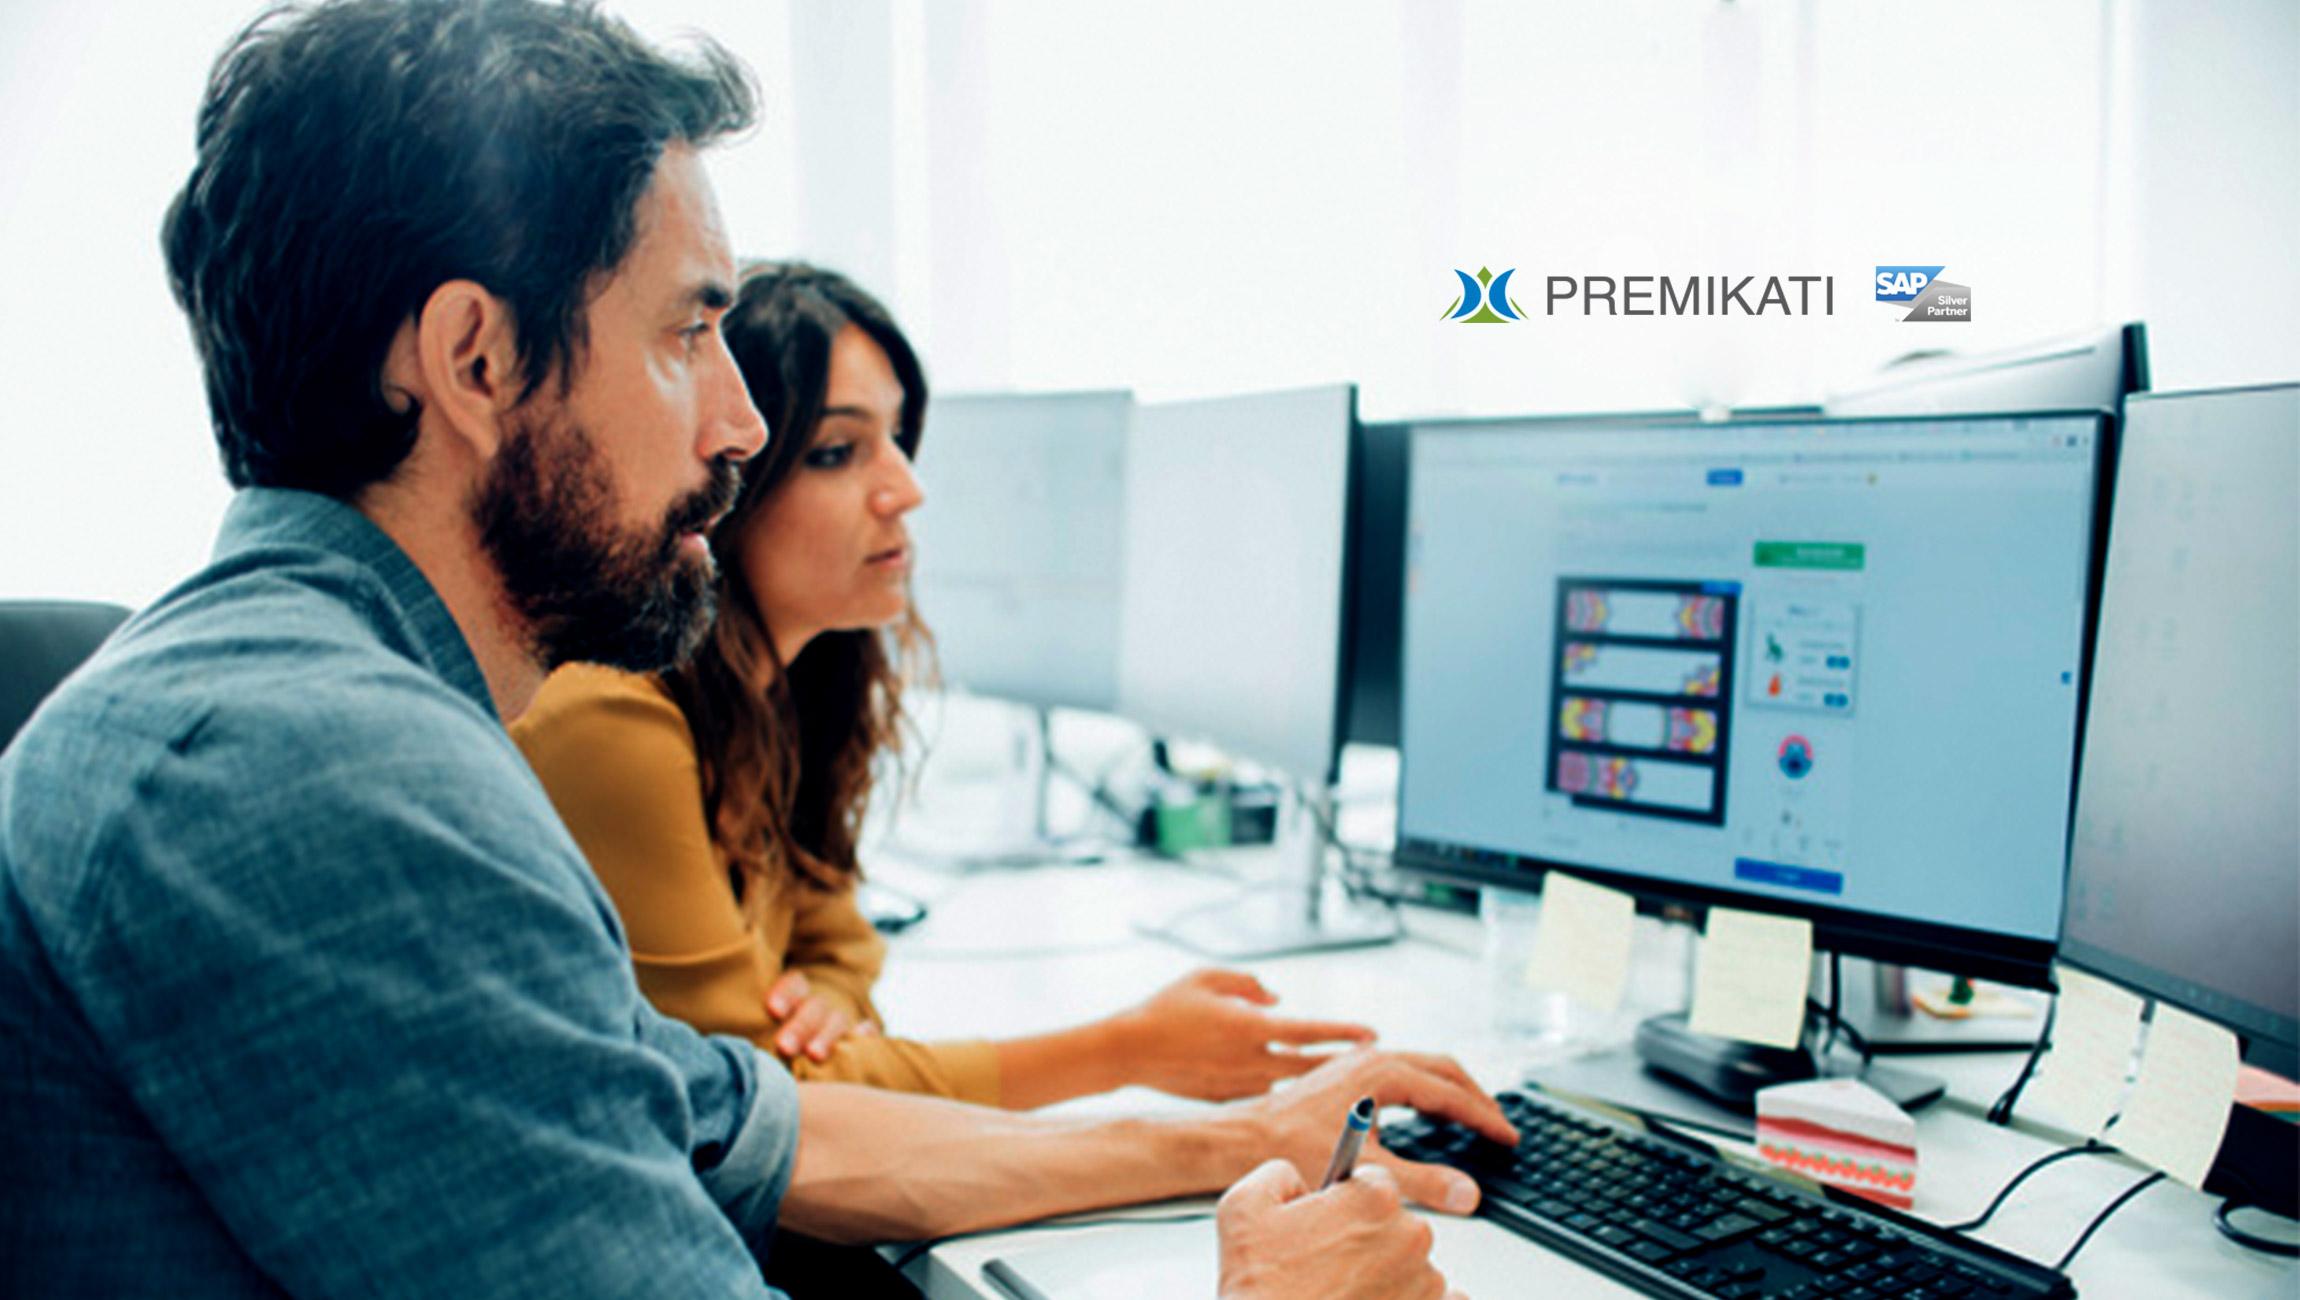 Premikati and SAP Ariba Deliver Enterprise-class Procurement for SMBs